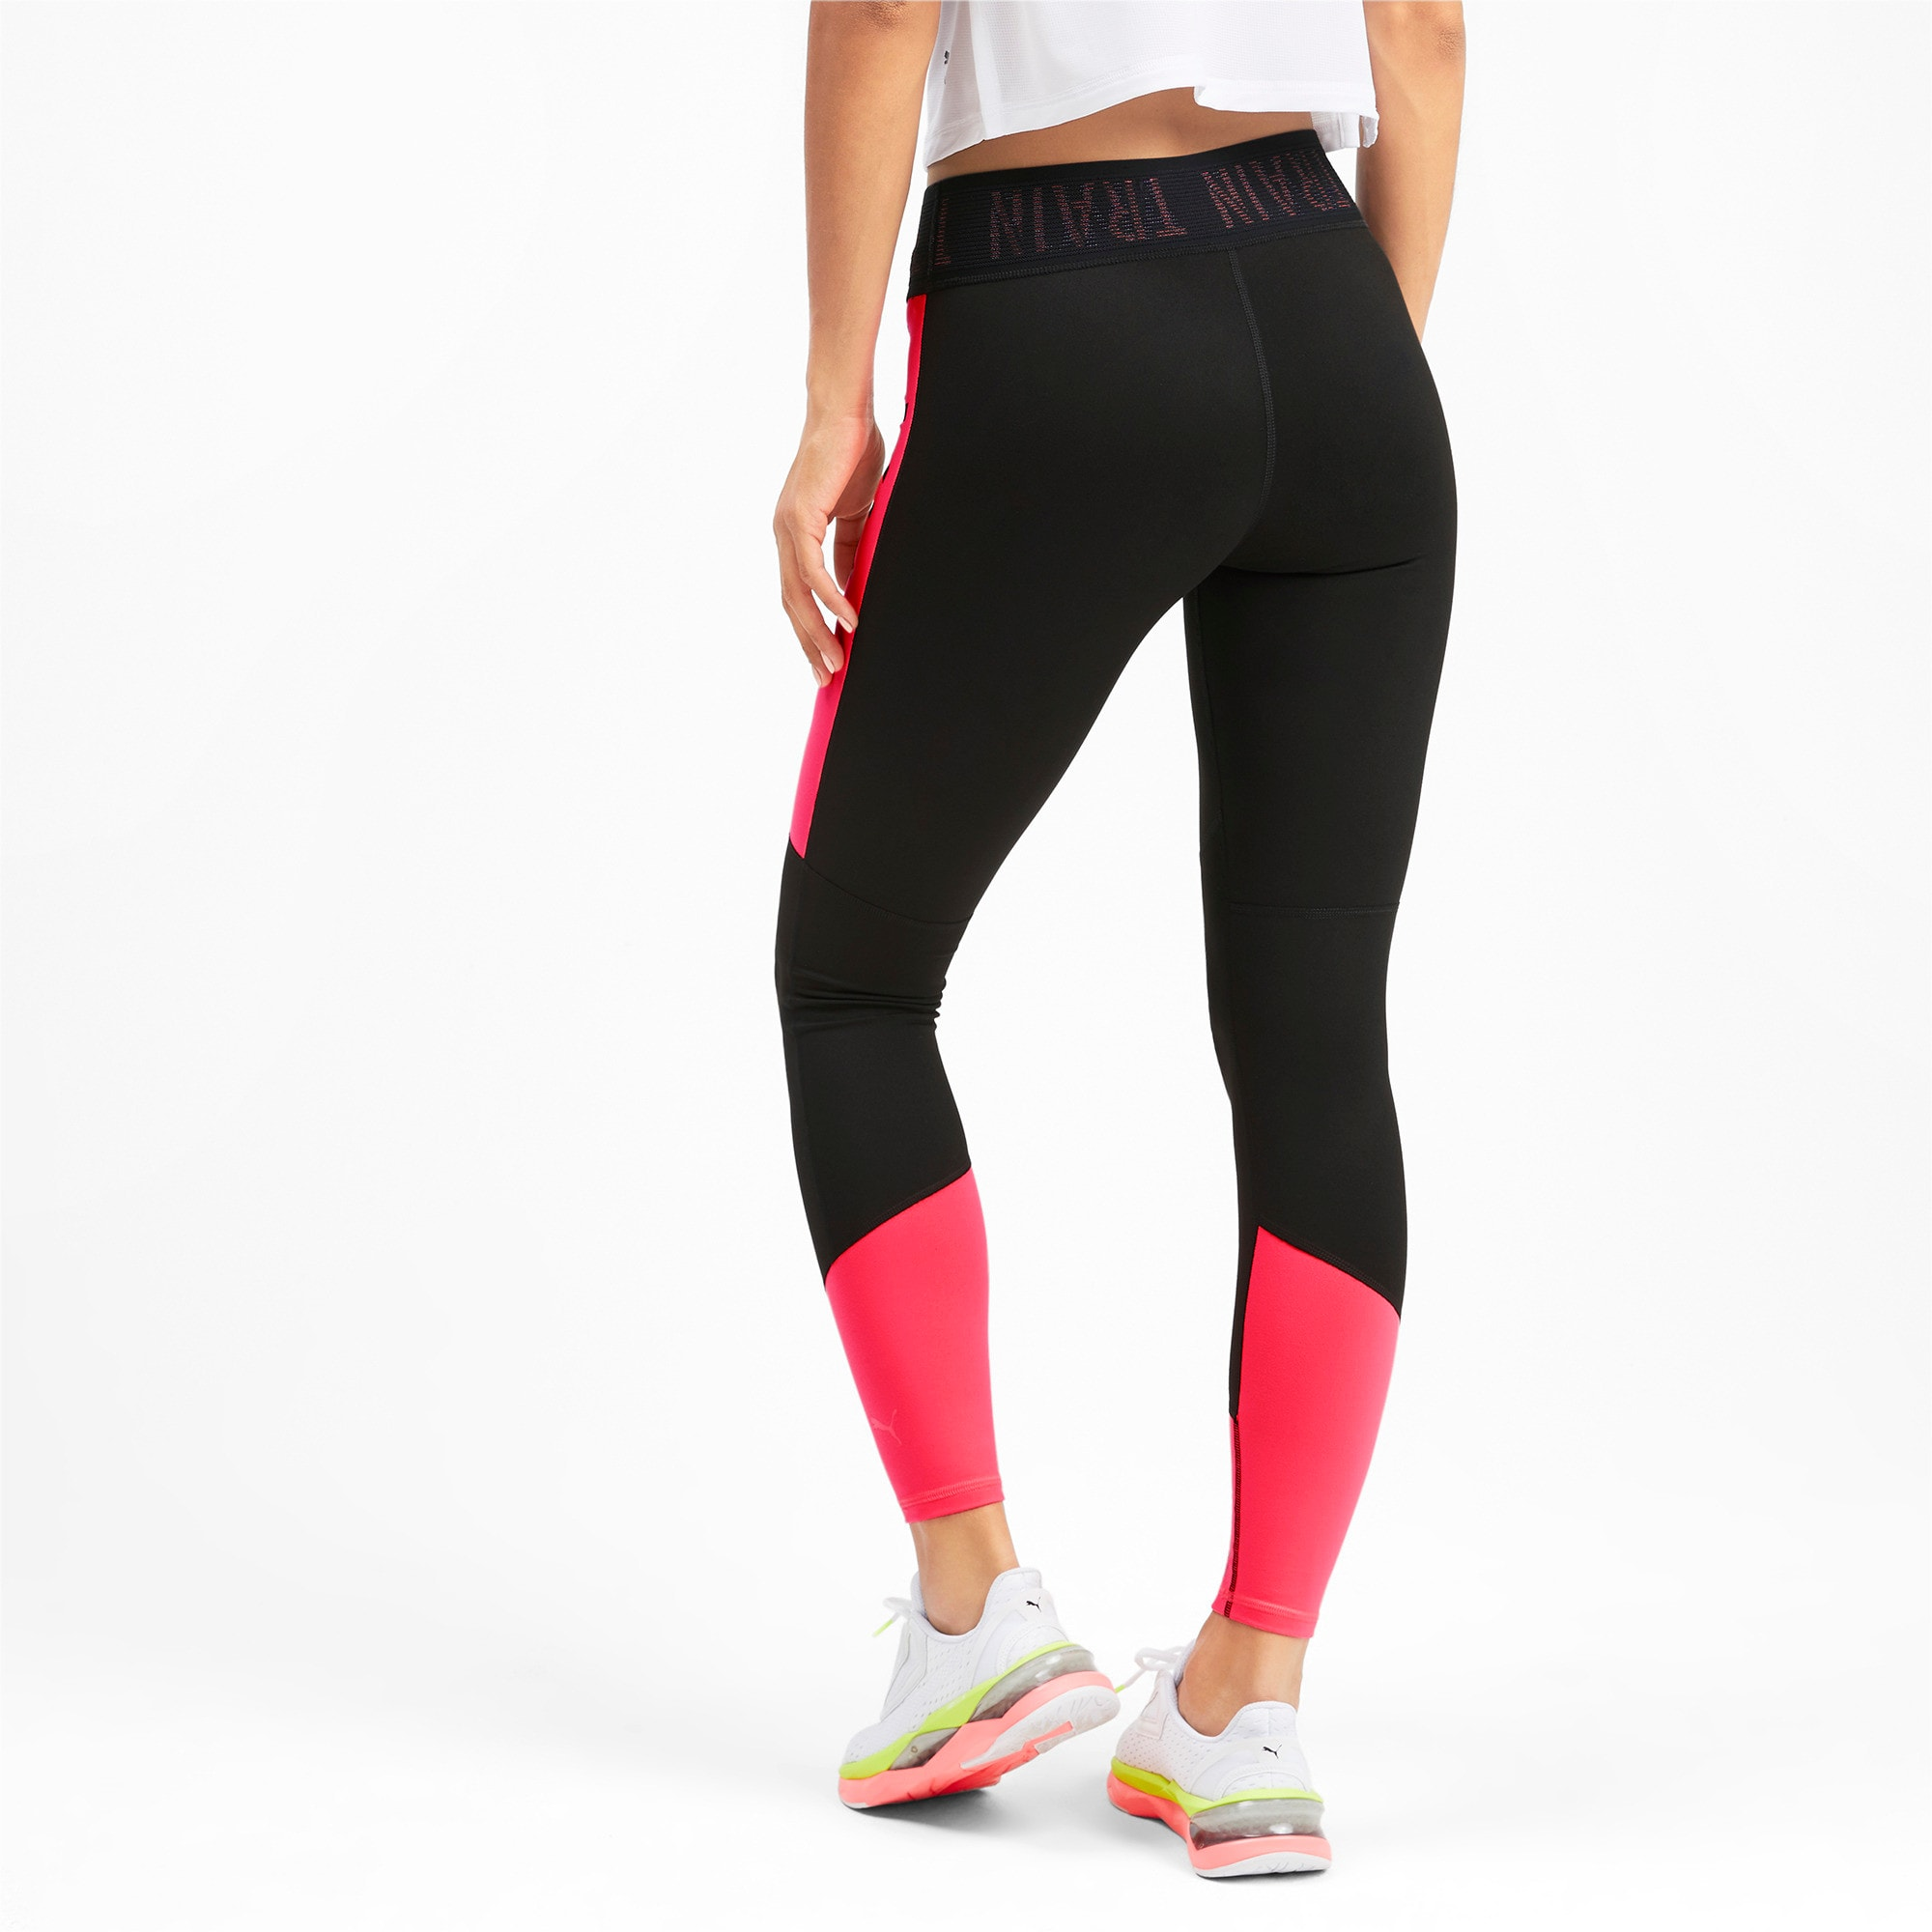 Thumbnail 2 of Logo Women's 7/8 Leggings, Puma Black-Pink Alert, medium